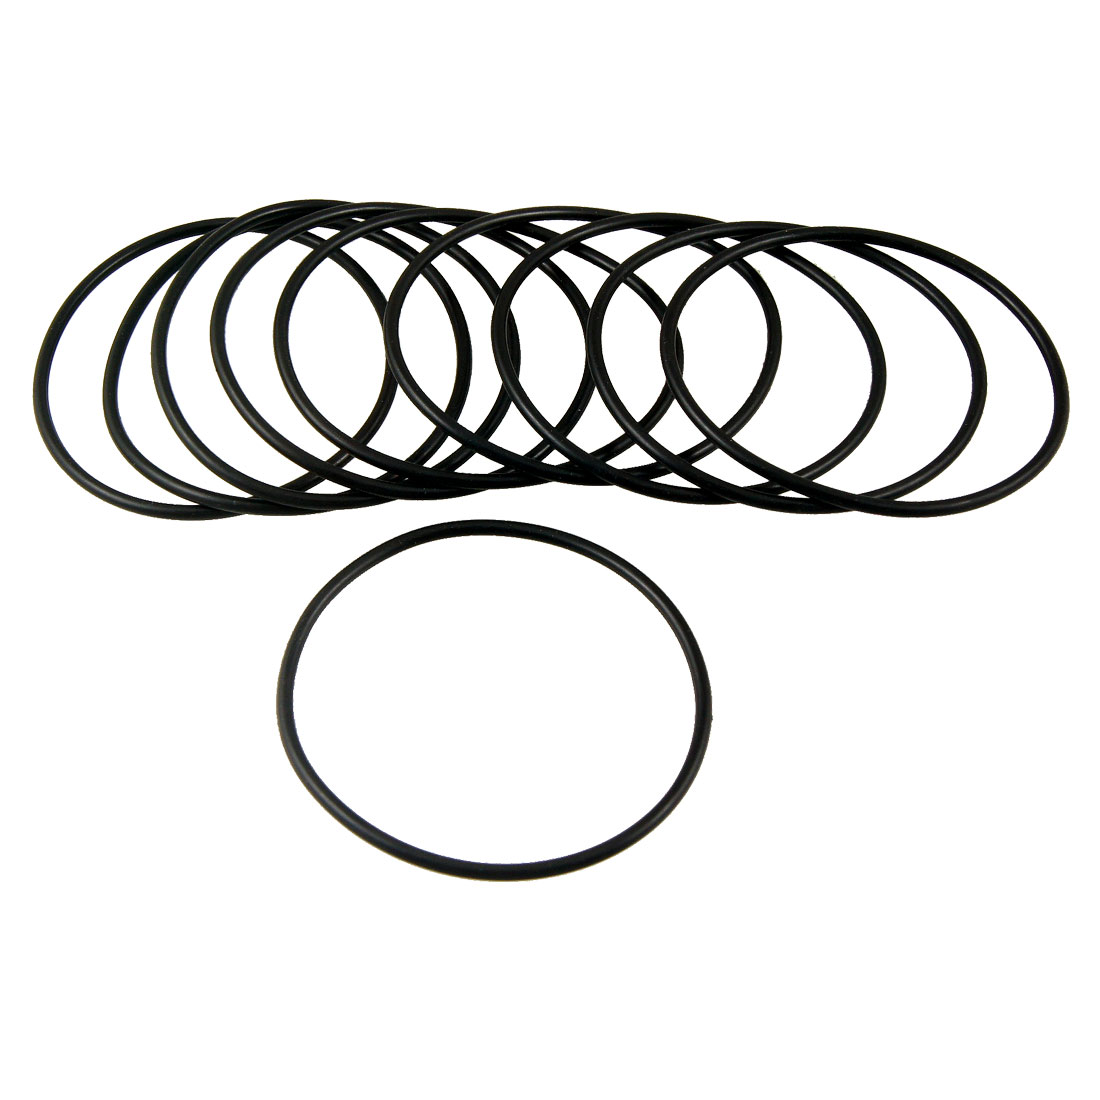 85mm x 3.1mm Flexible Rubber O Ring Sealing Washer Black 10 Pcs